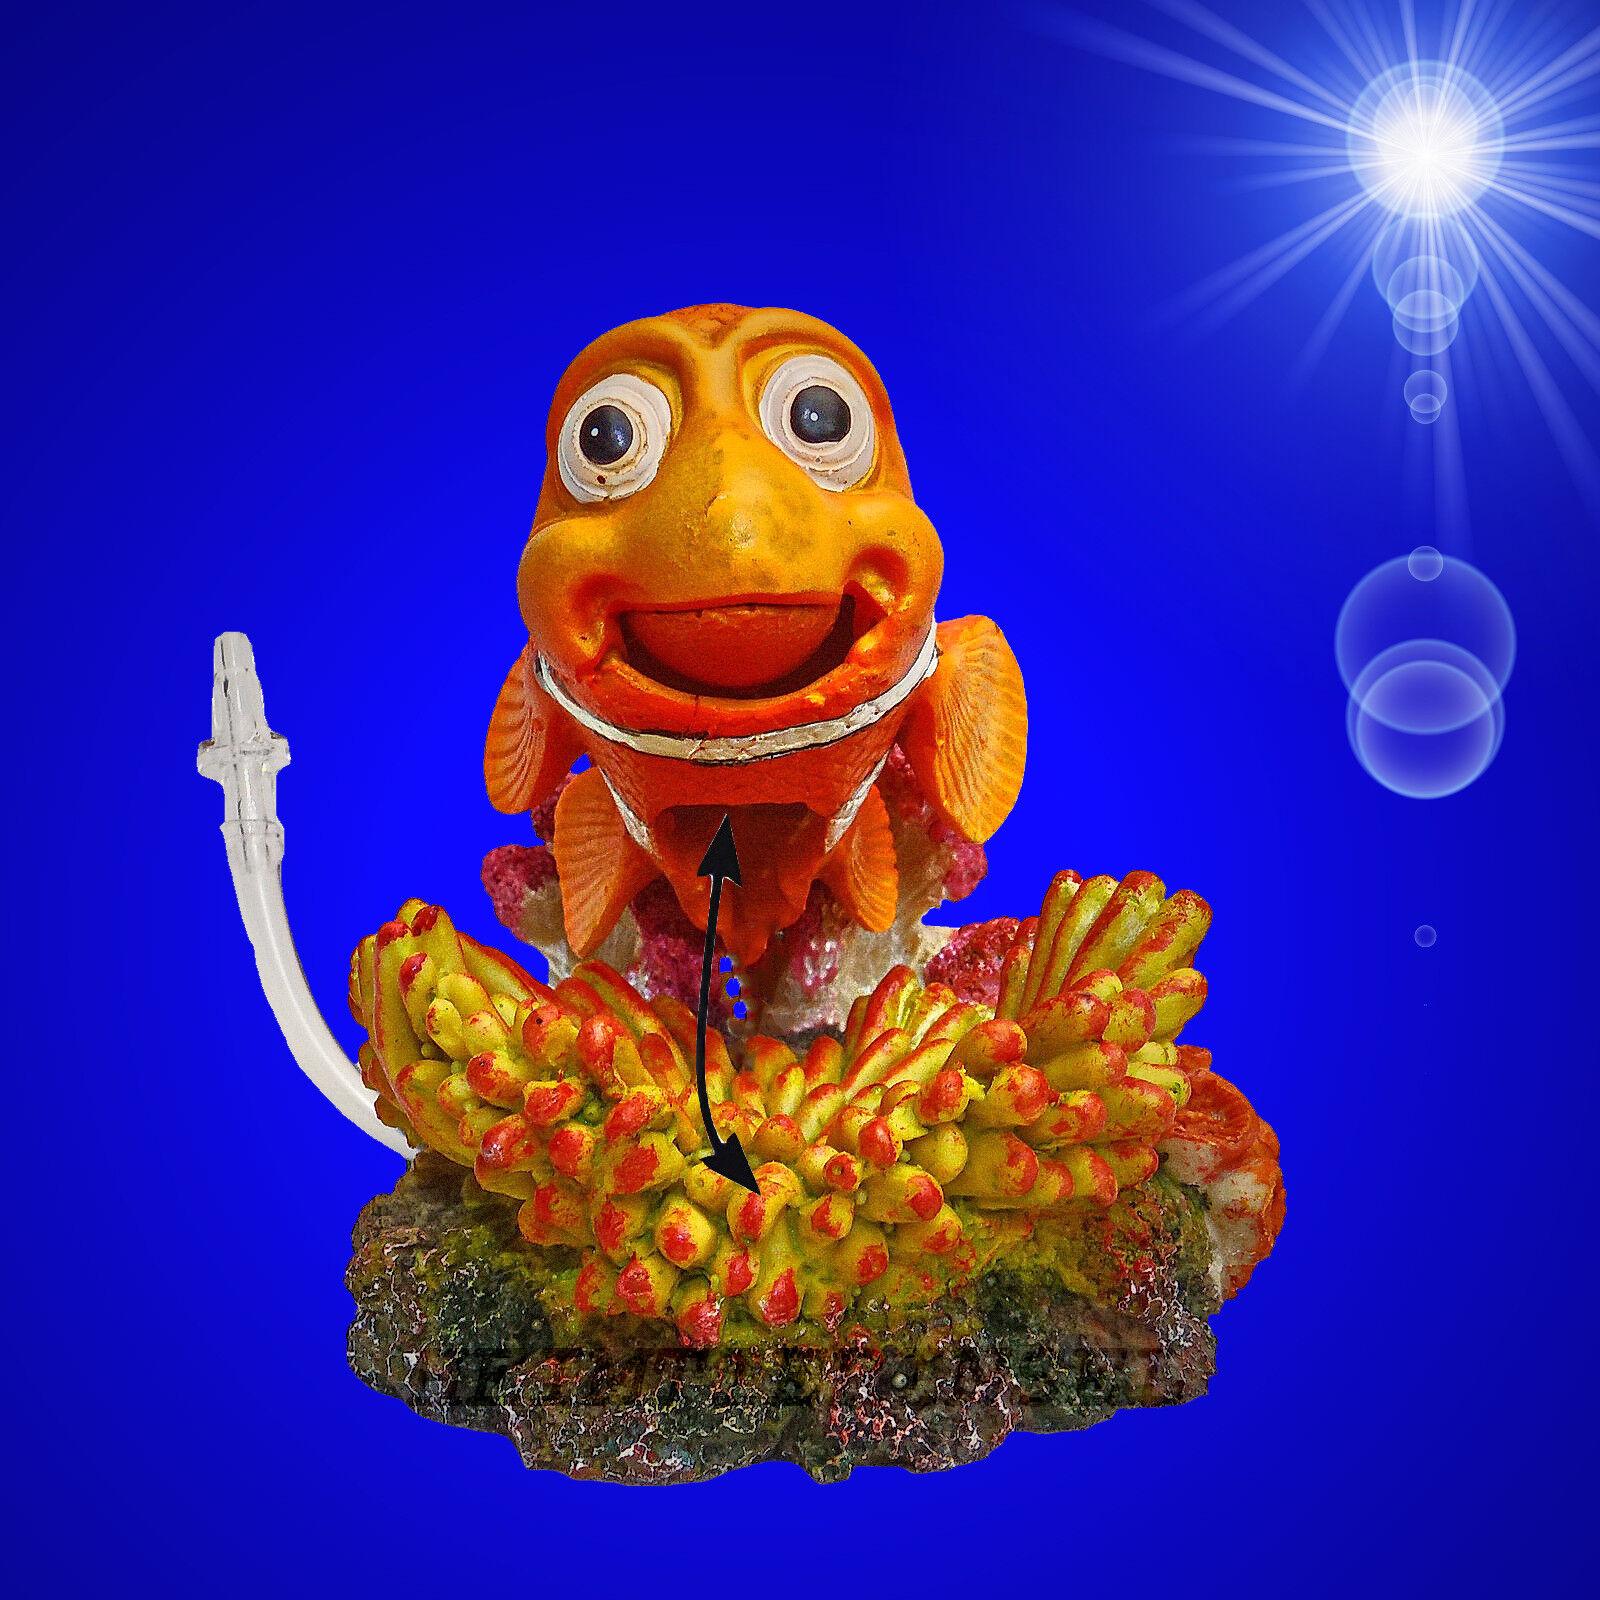 Kupit Aquarium Deko Beweglicher Nemo Luftpumpe Na Ebay De Iz Germanii S Dostavkoj V Rossiyu Ukrainu Kazahstan